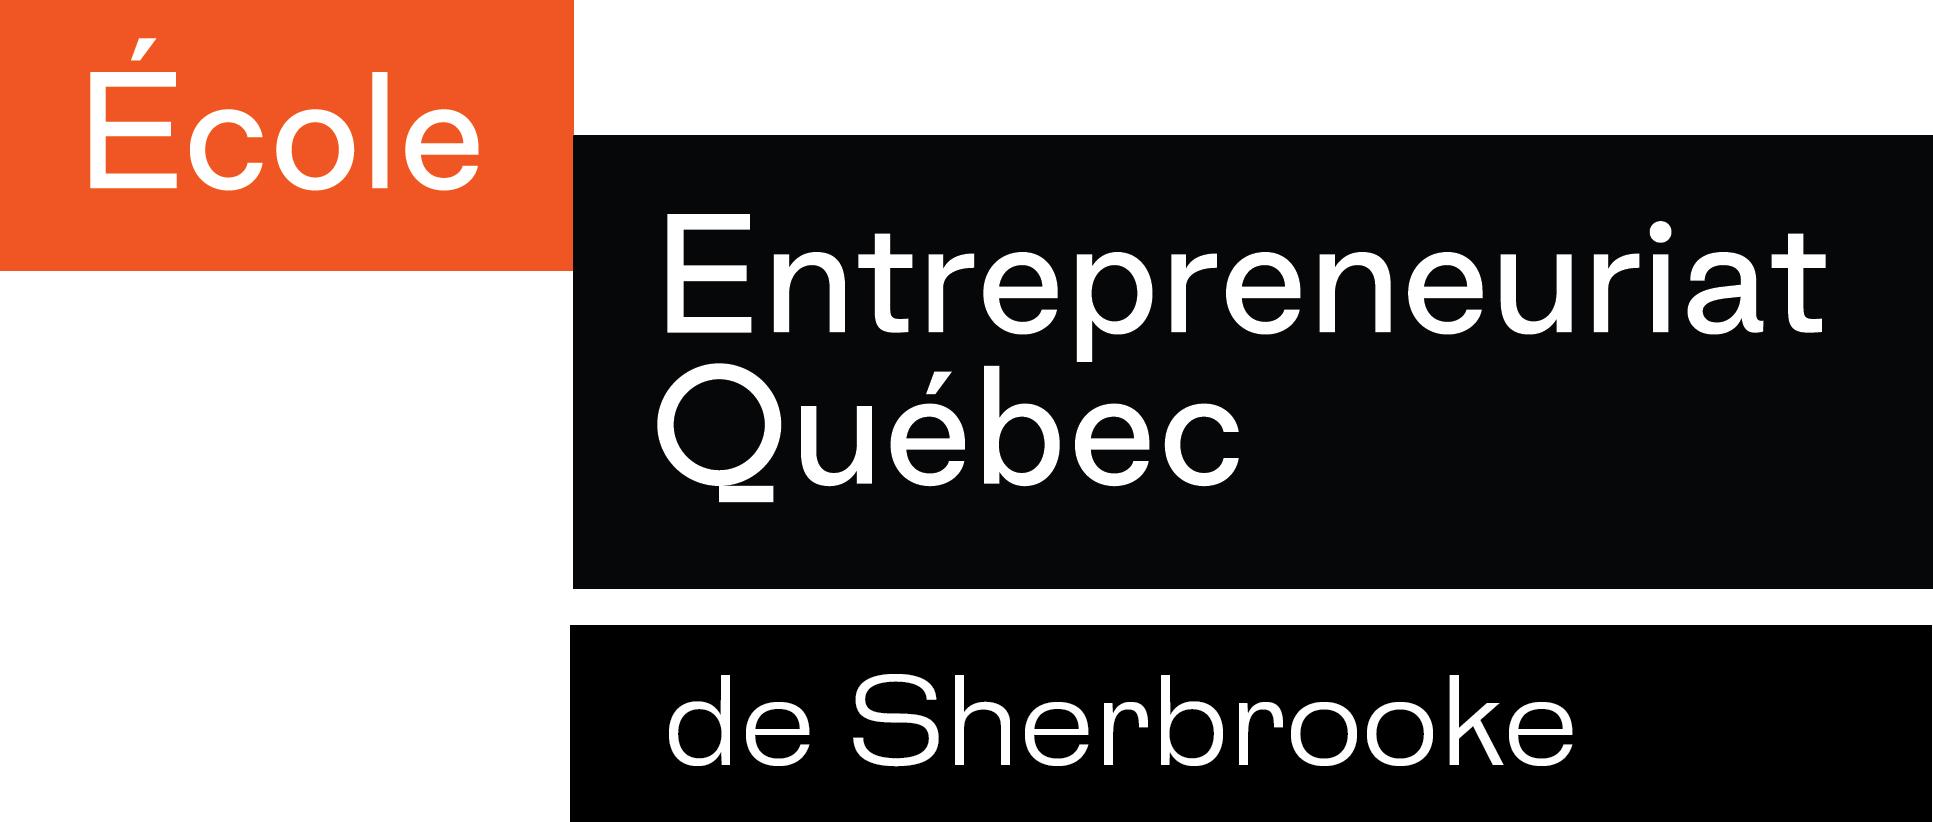 Logos ÉEQ de Sherbrooke.jpg